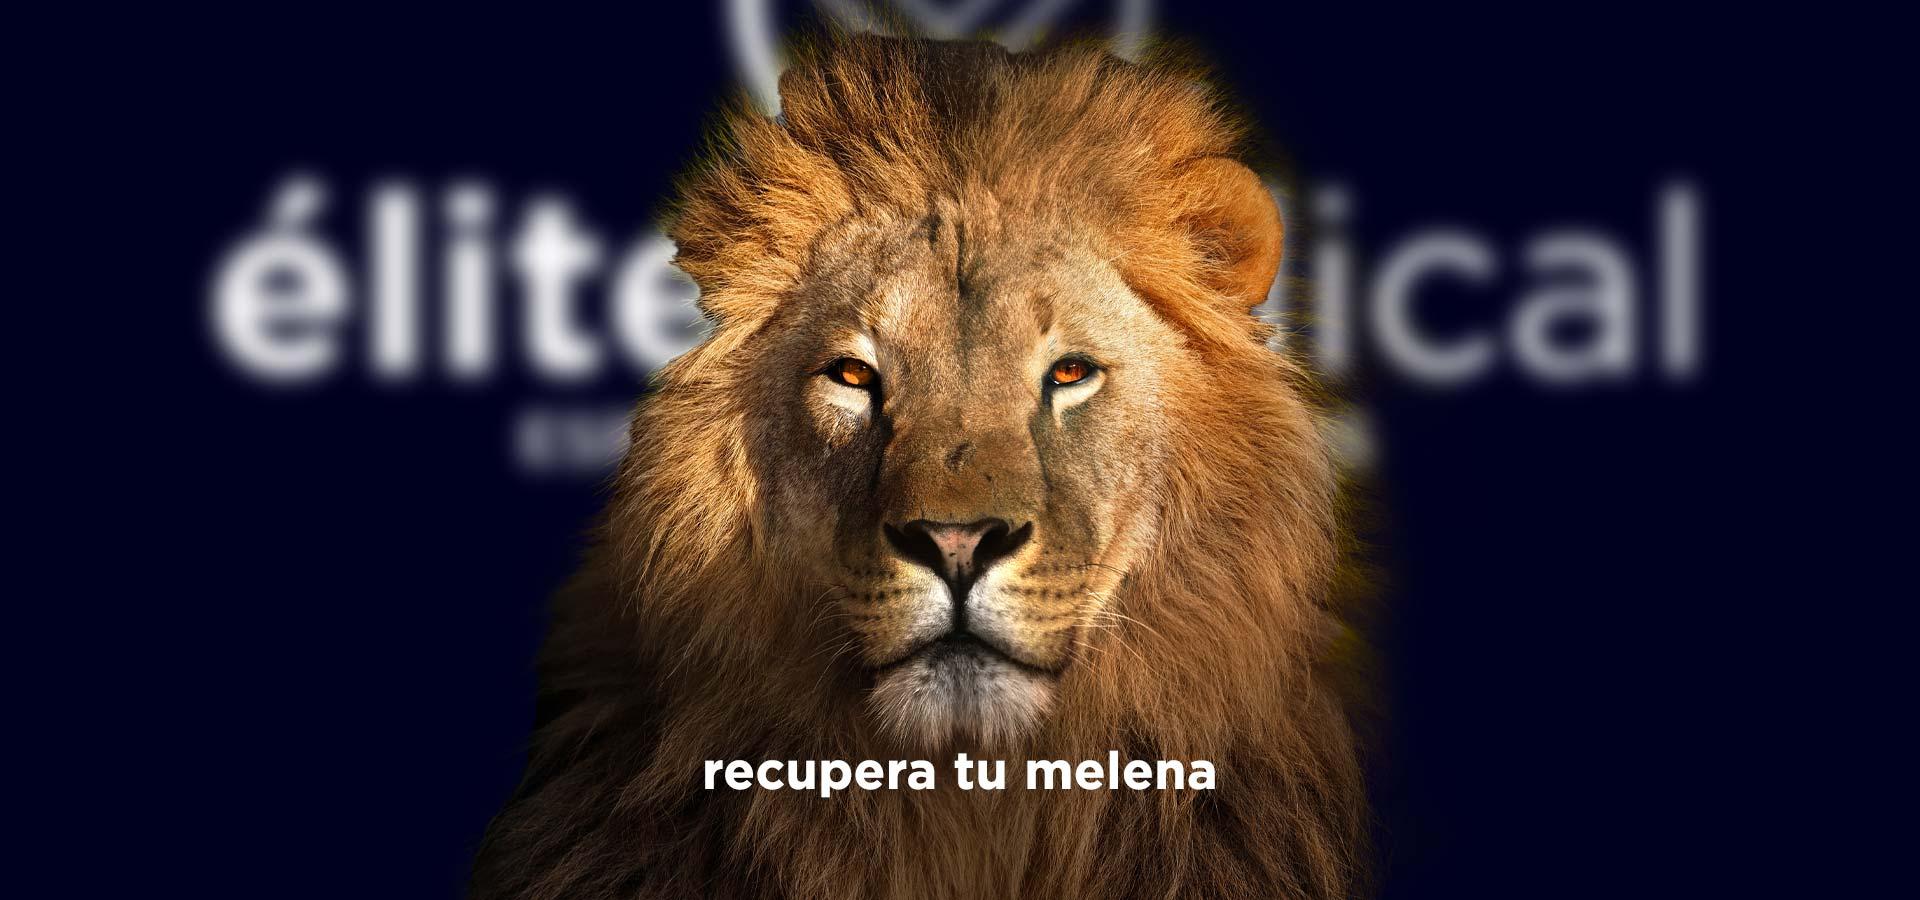 Recupera tu melena en Élite Medical Madrid